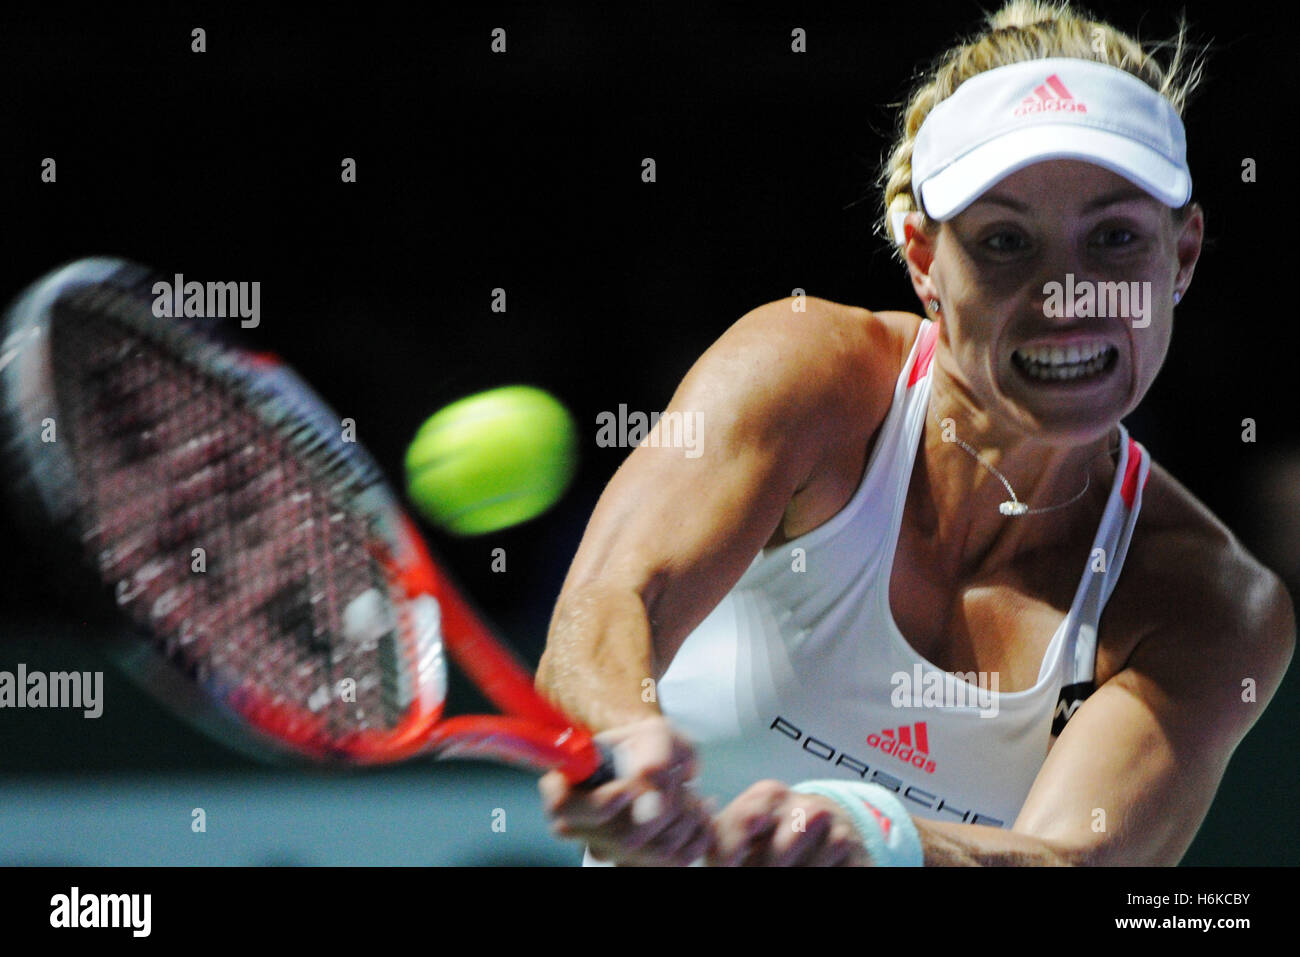 Singapur. 30. Oktober 2016. Angelique Kerber Deutschland konkurriert in der WTA-Finale Match gegen Dominika Cibulkova Stockbild